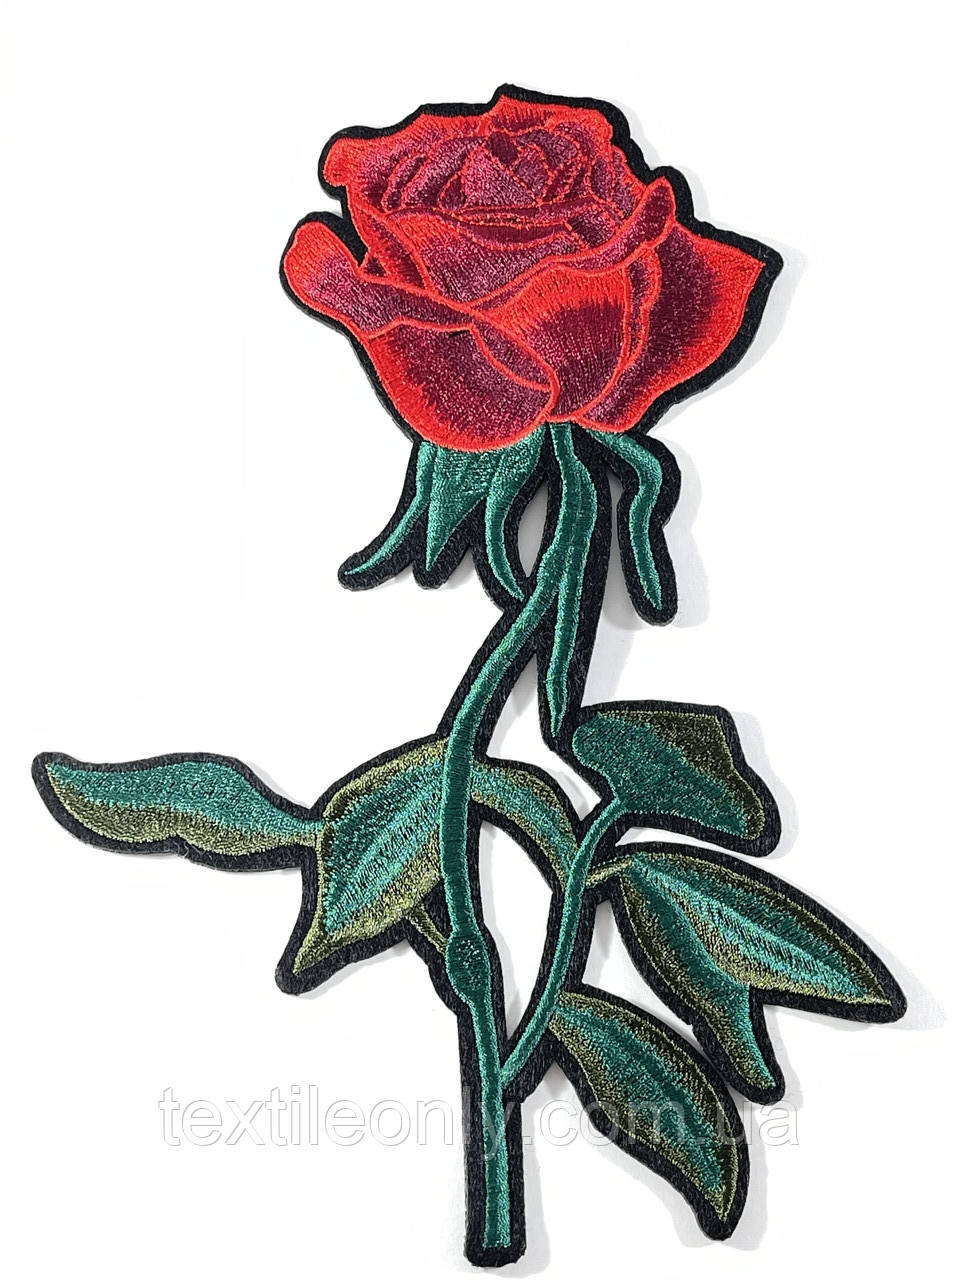 Нашивка троянда 155х225 мм